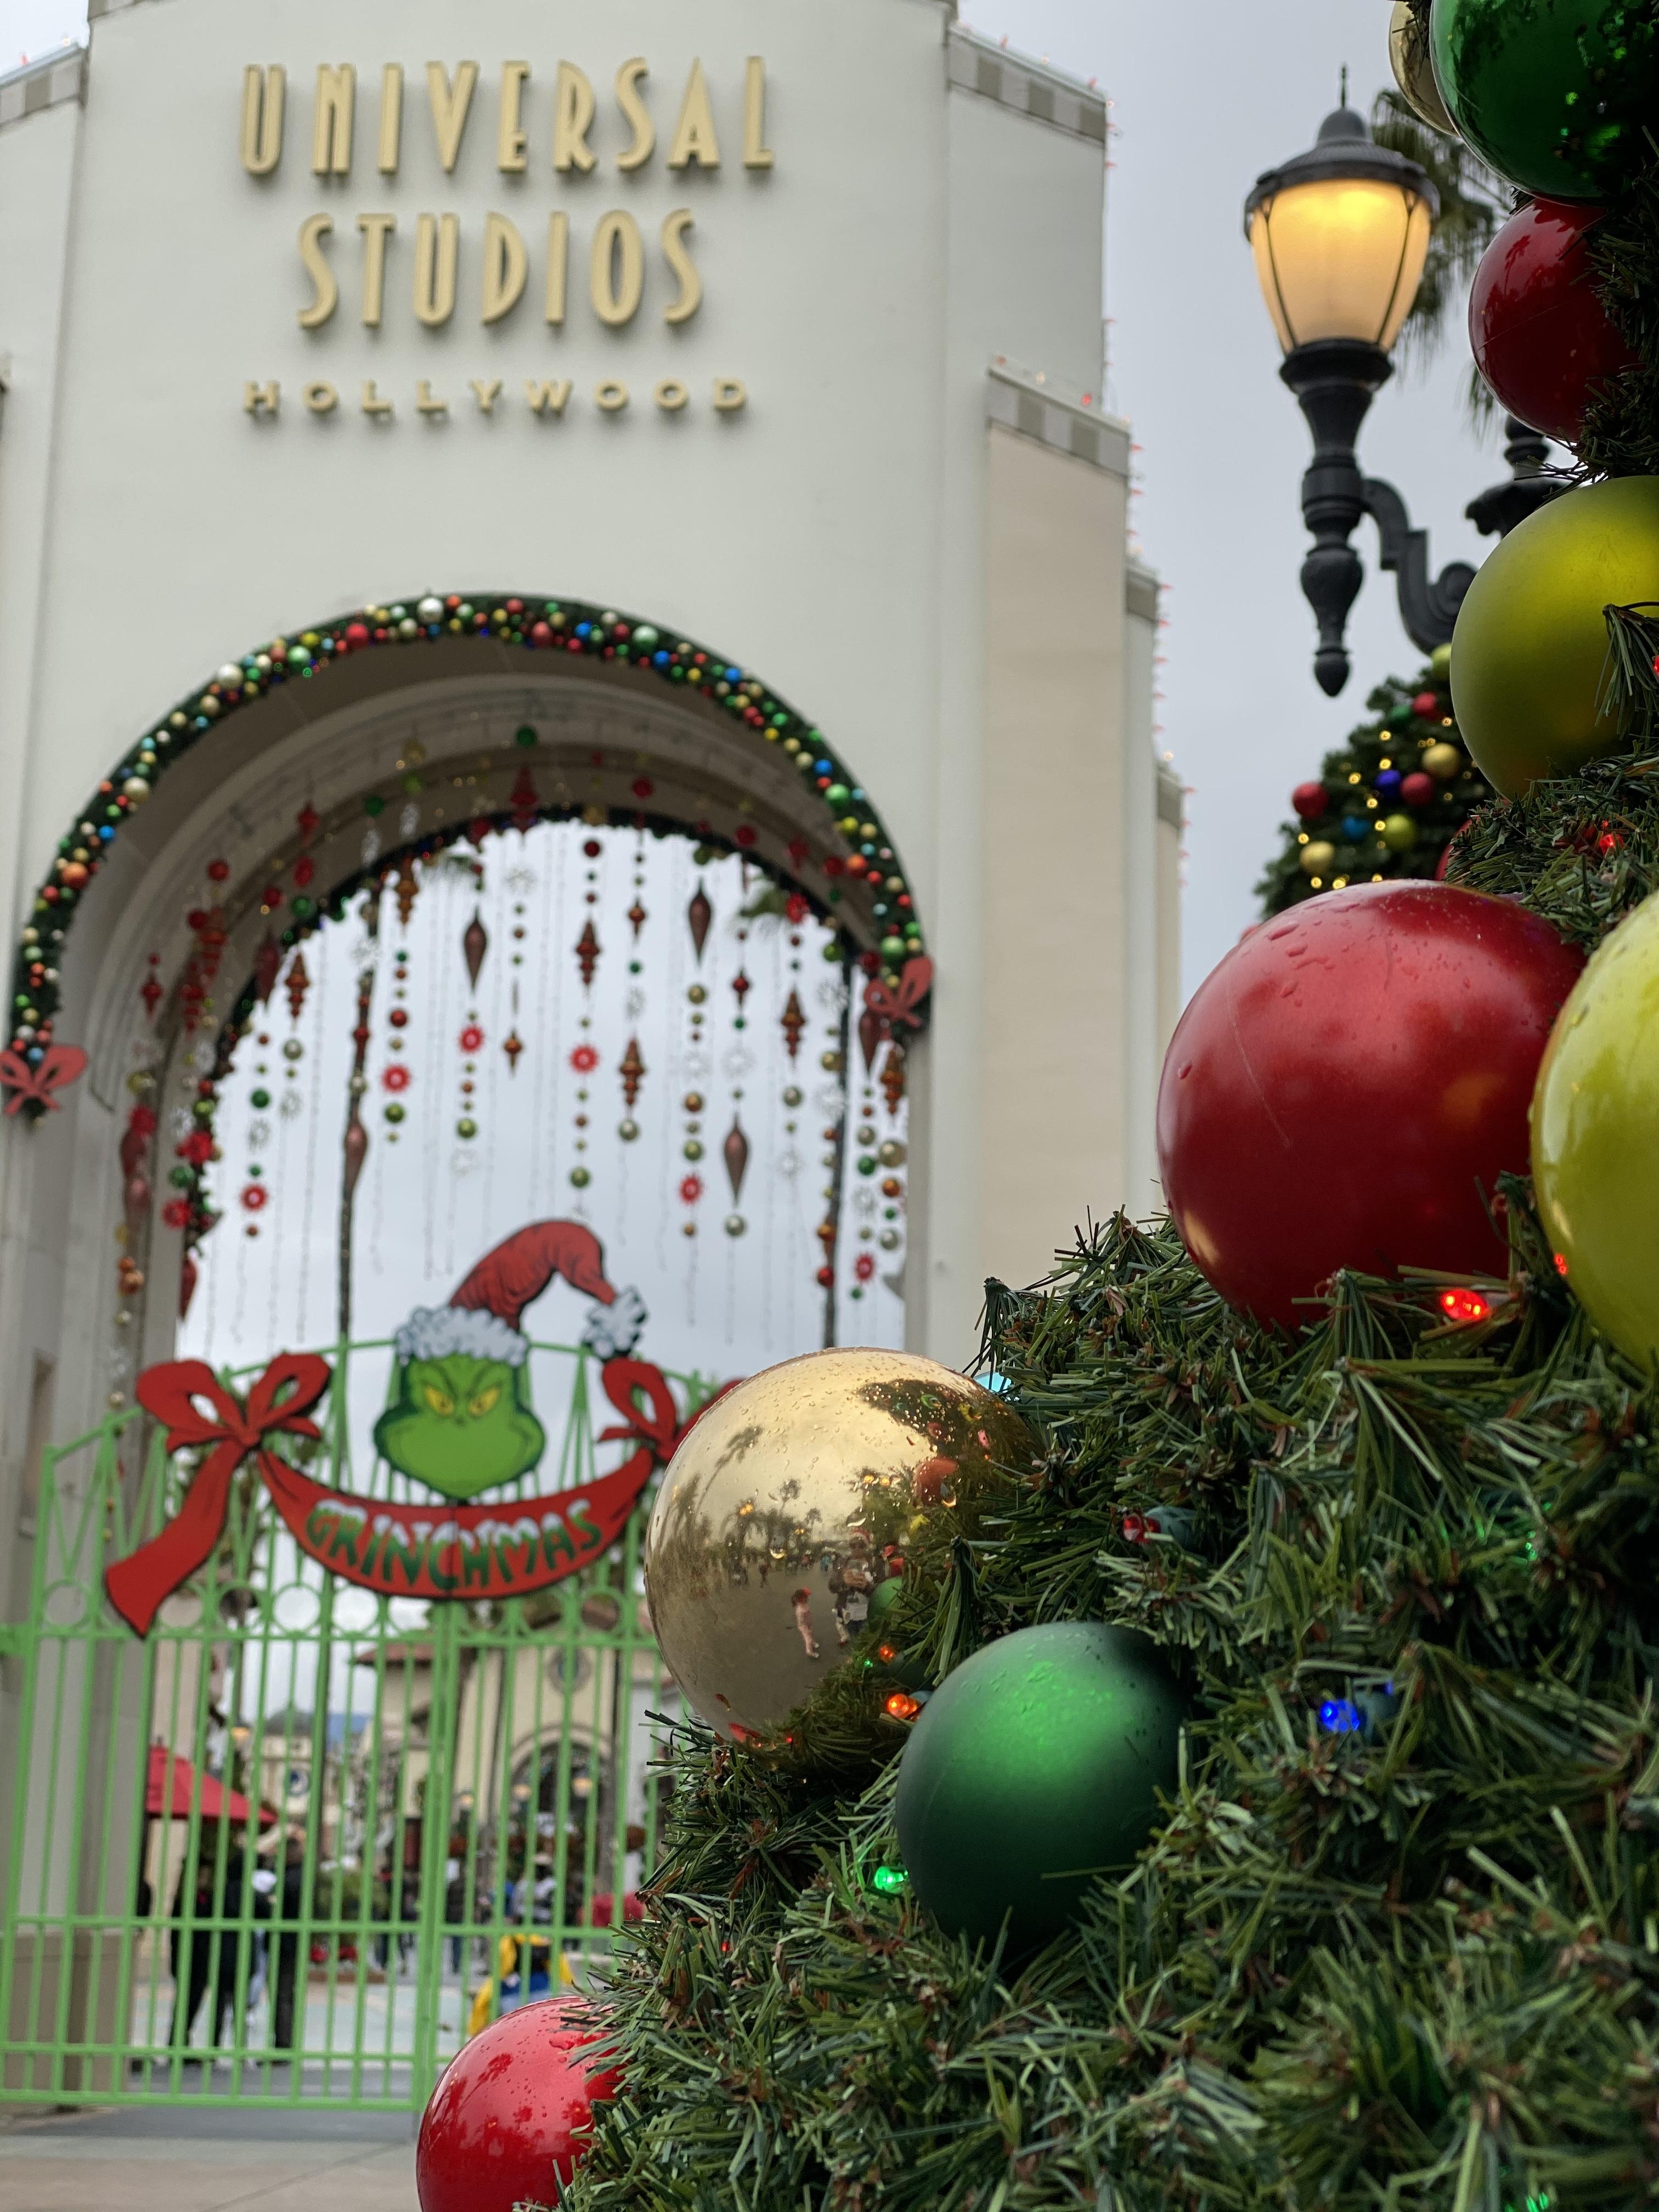 vamos-a-universal-studios-hollywood-esta-temporada-festiva